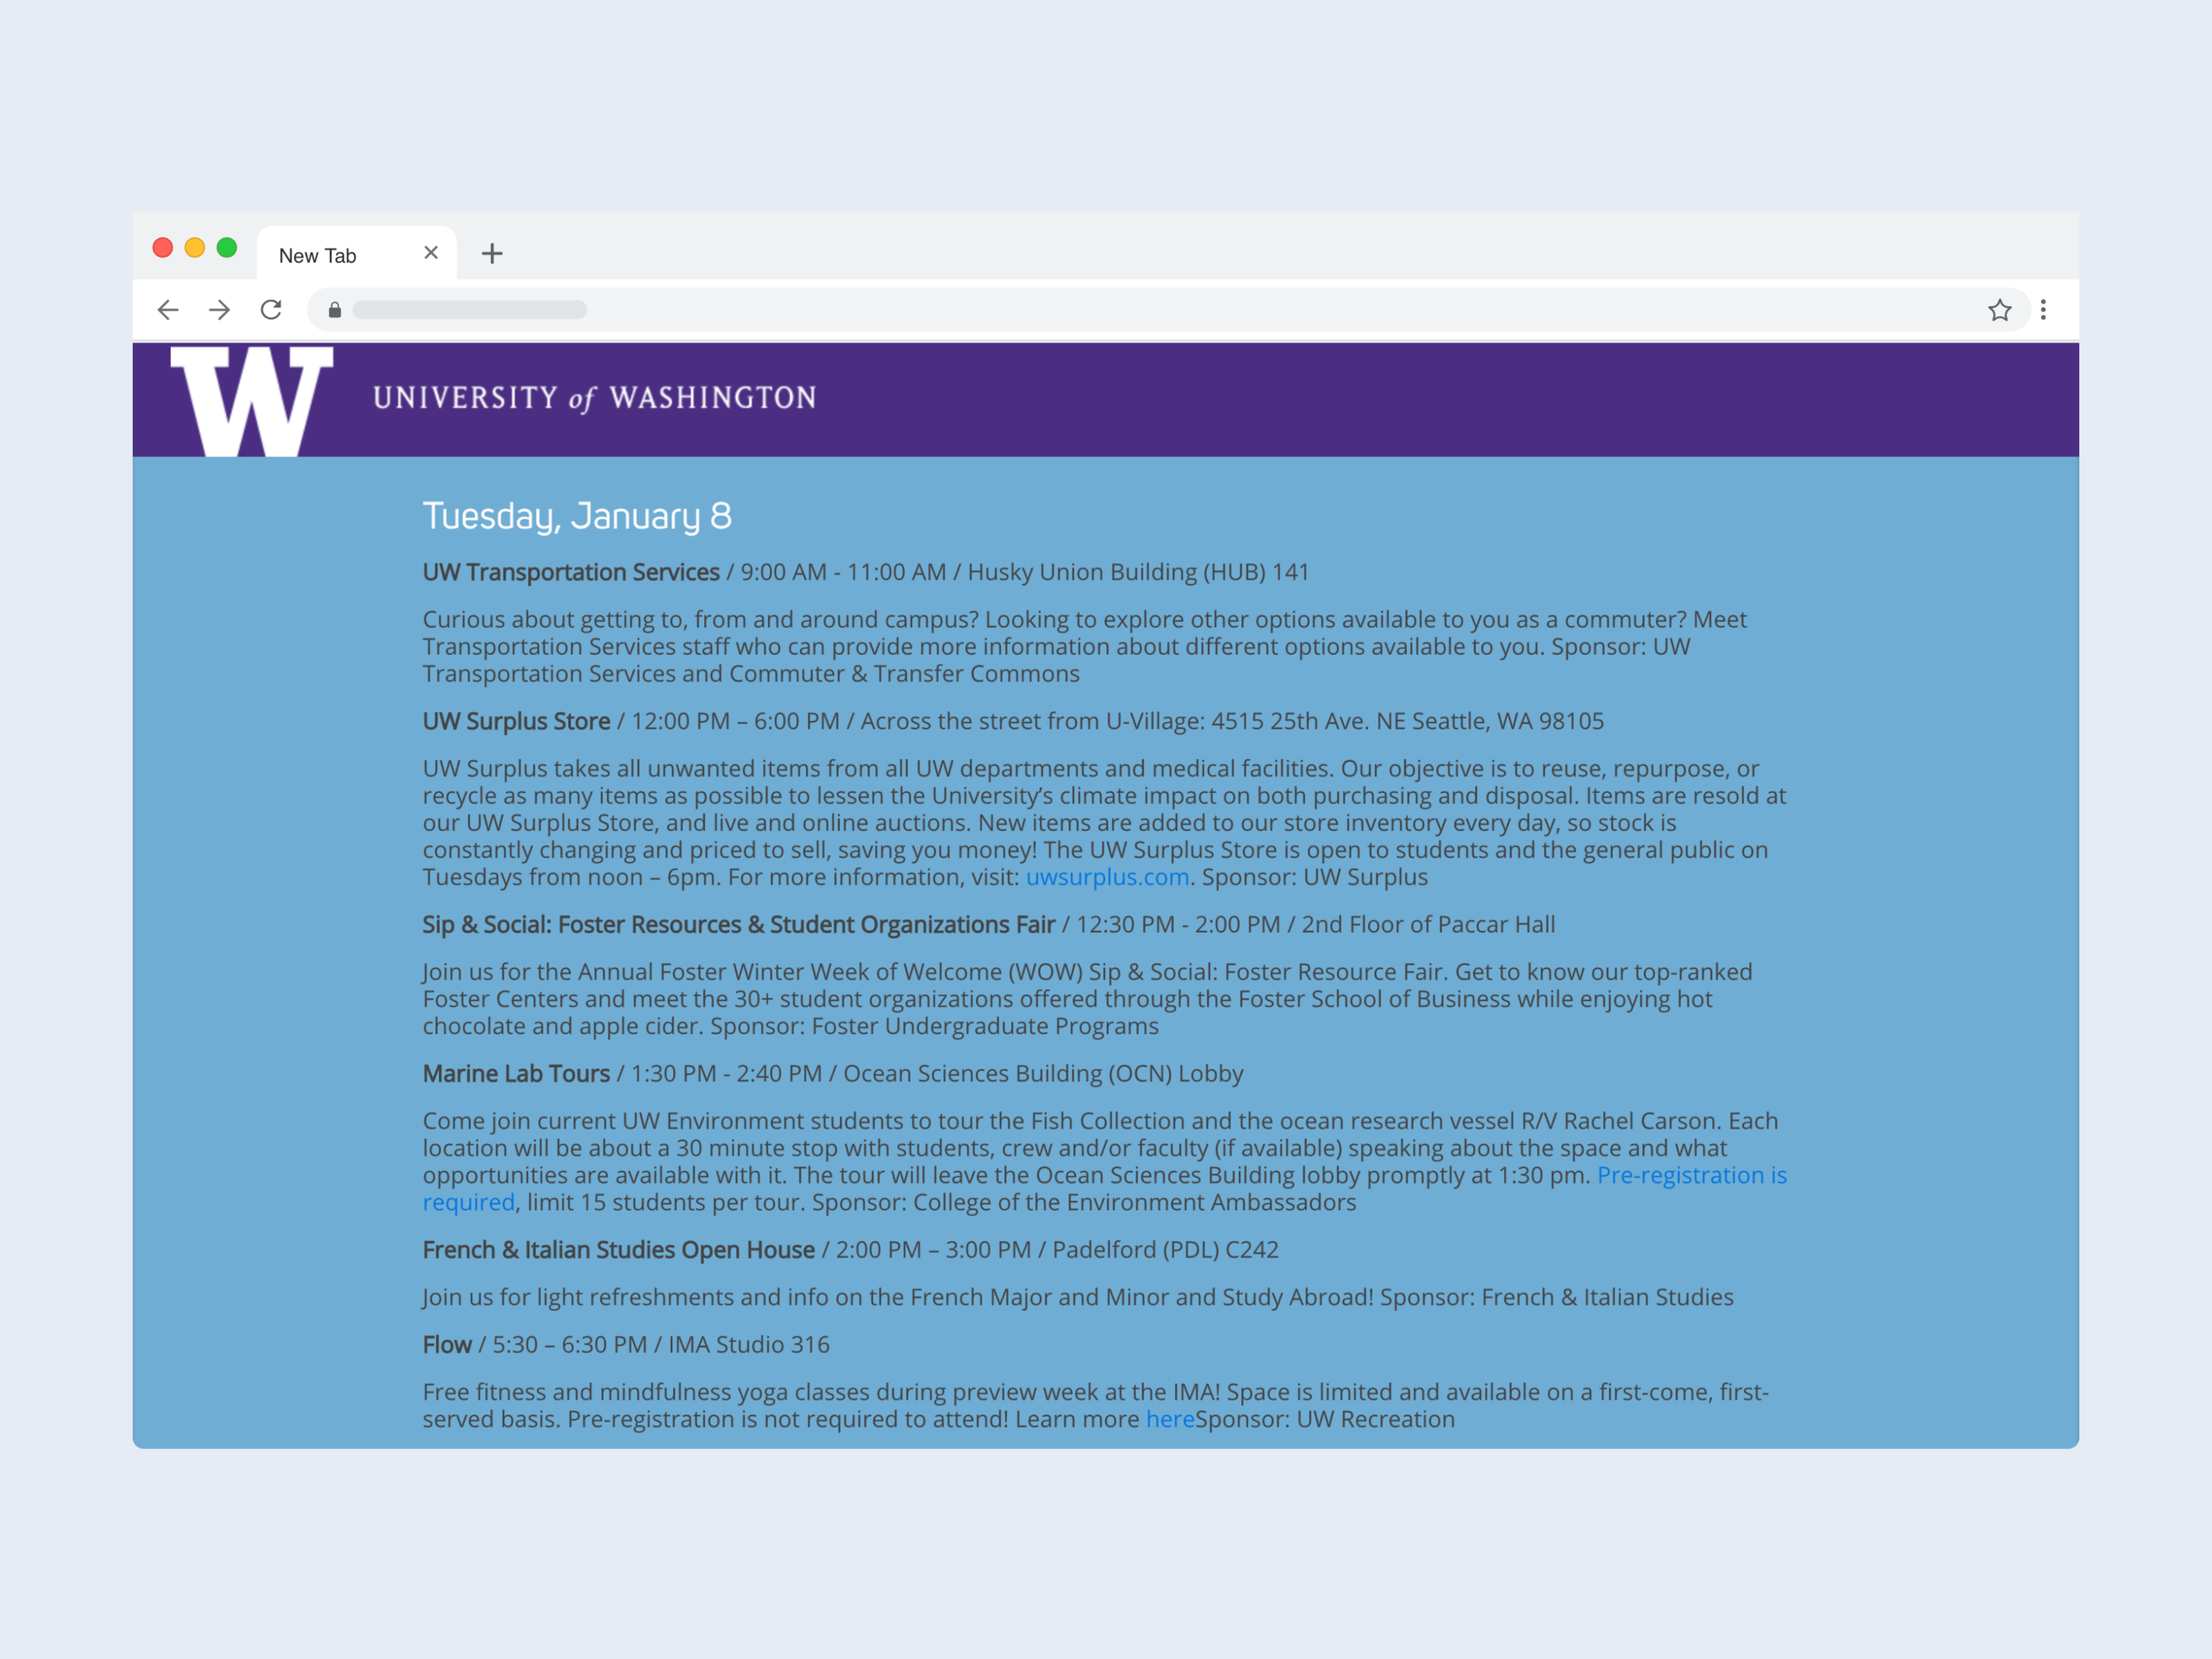 UW's current website for orientation events